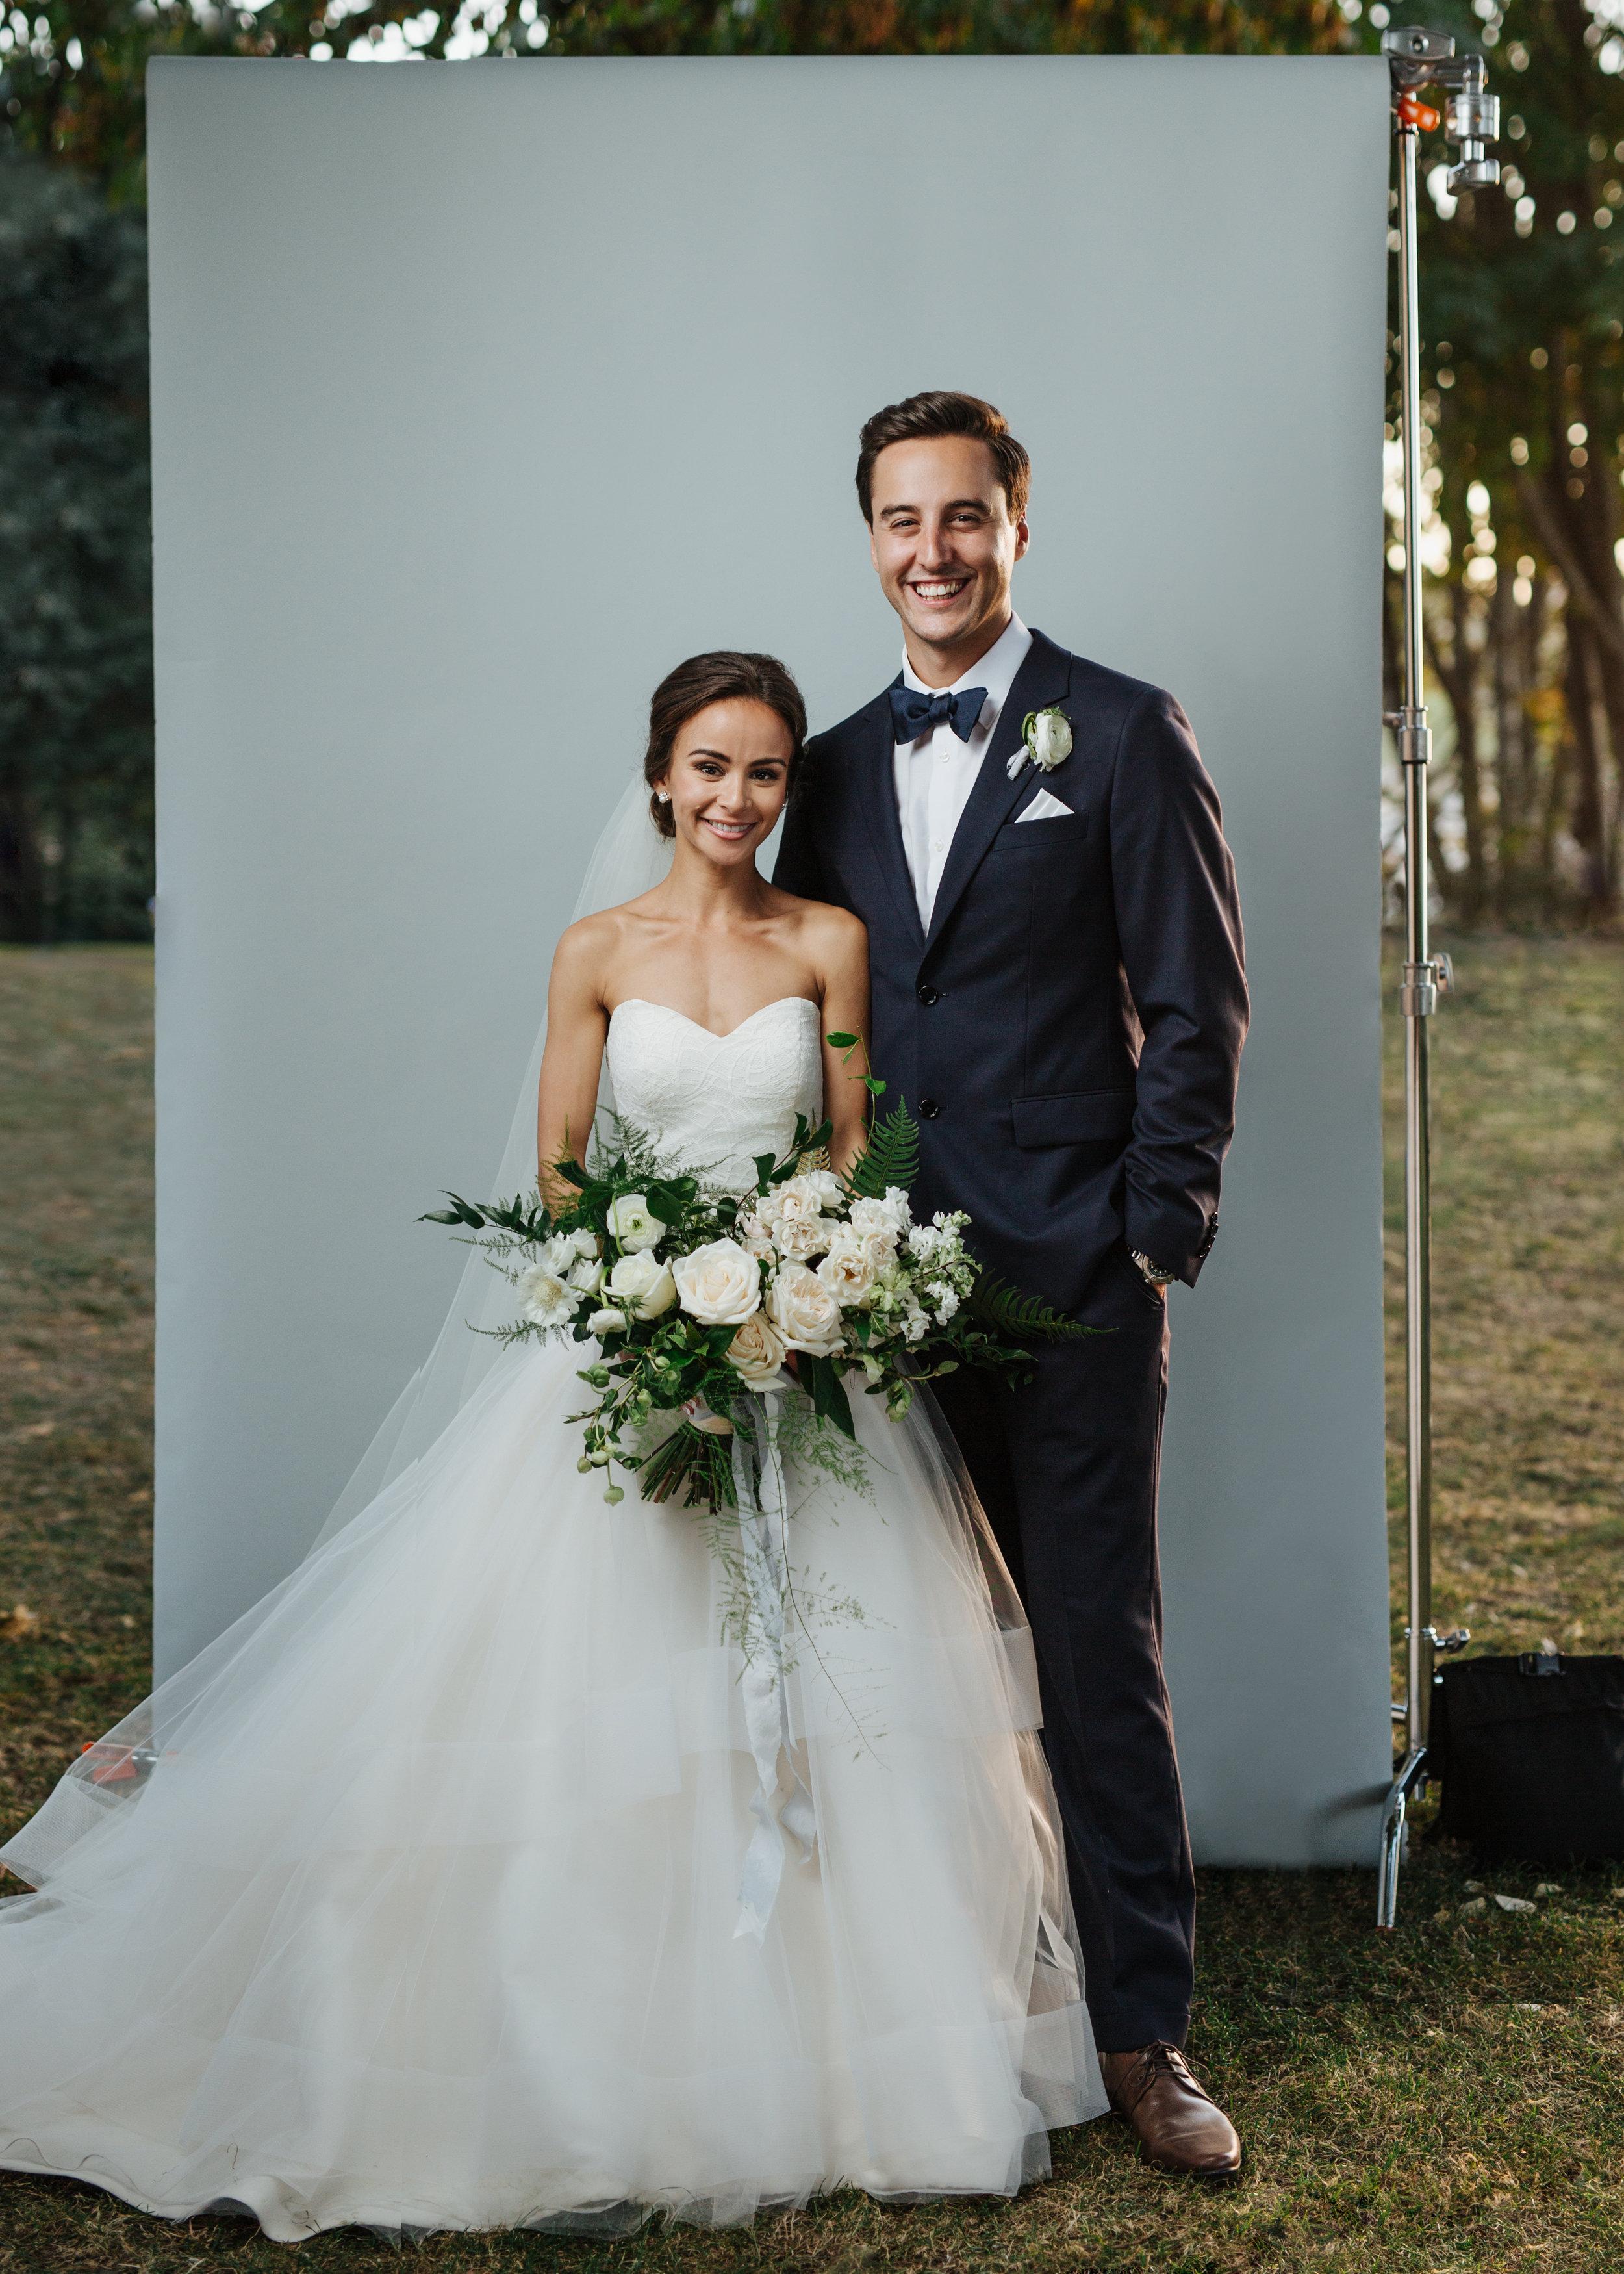 herafilms_carlotta_alex_wedding_hera_highres-55.jpg